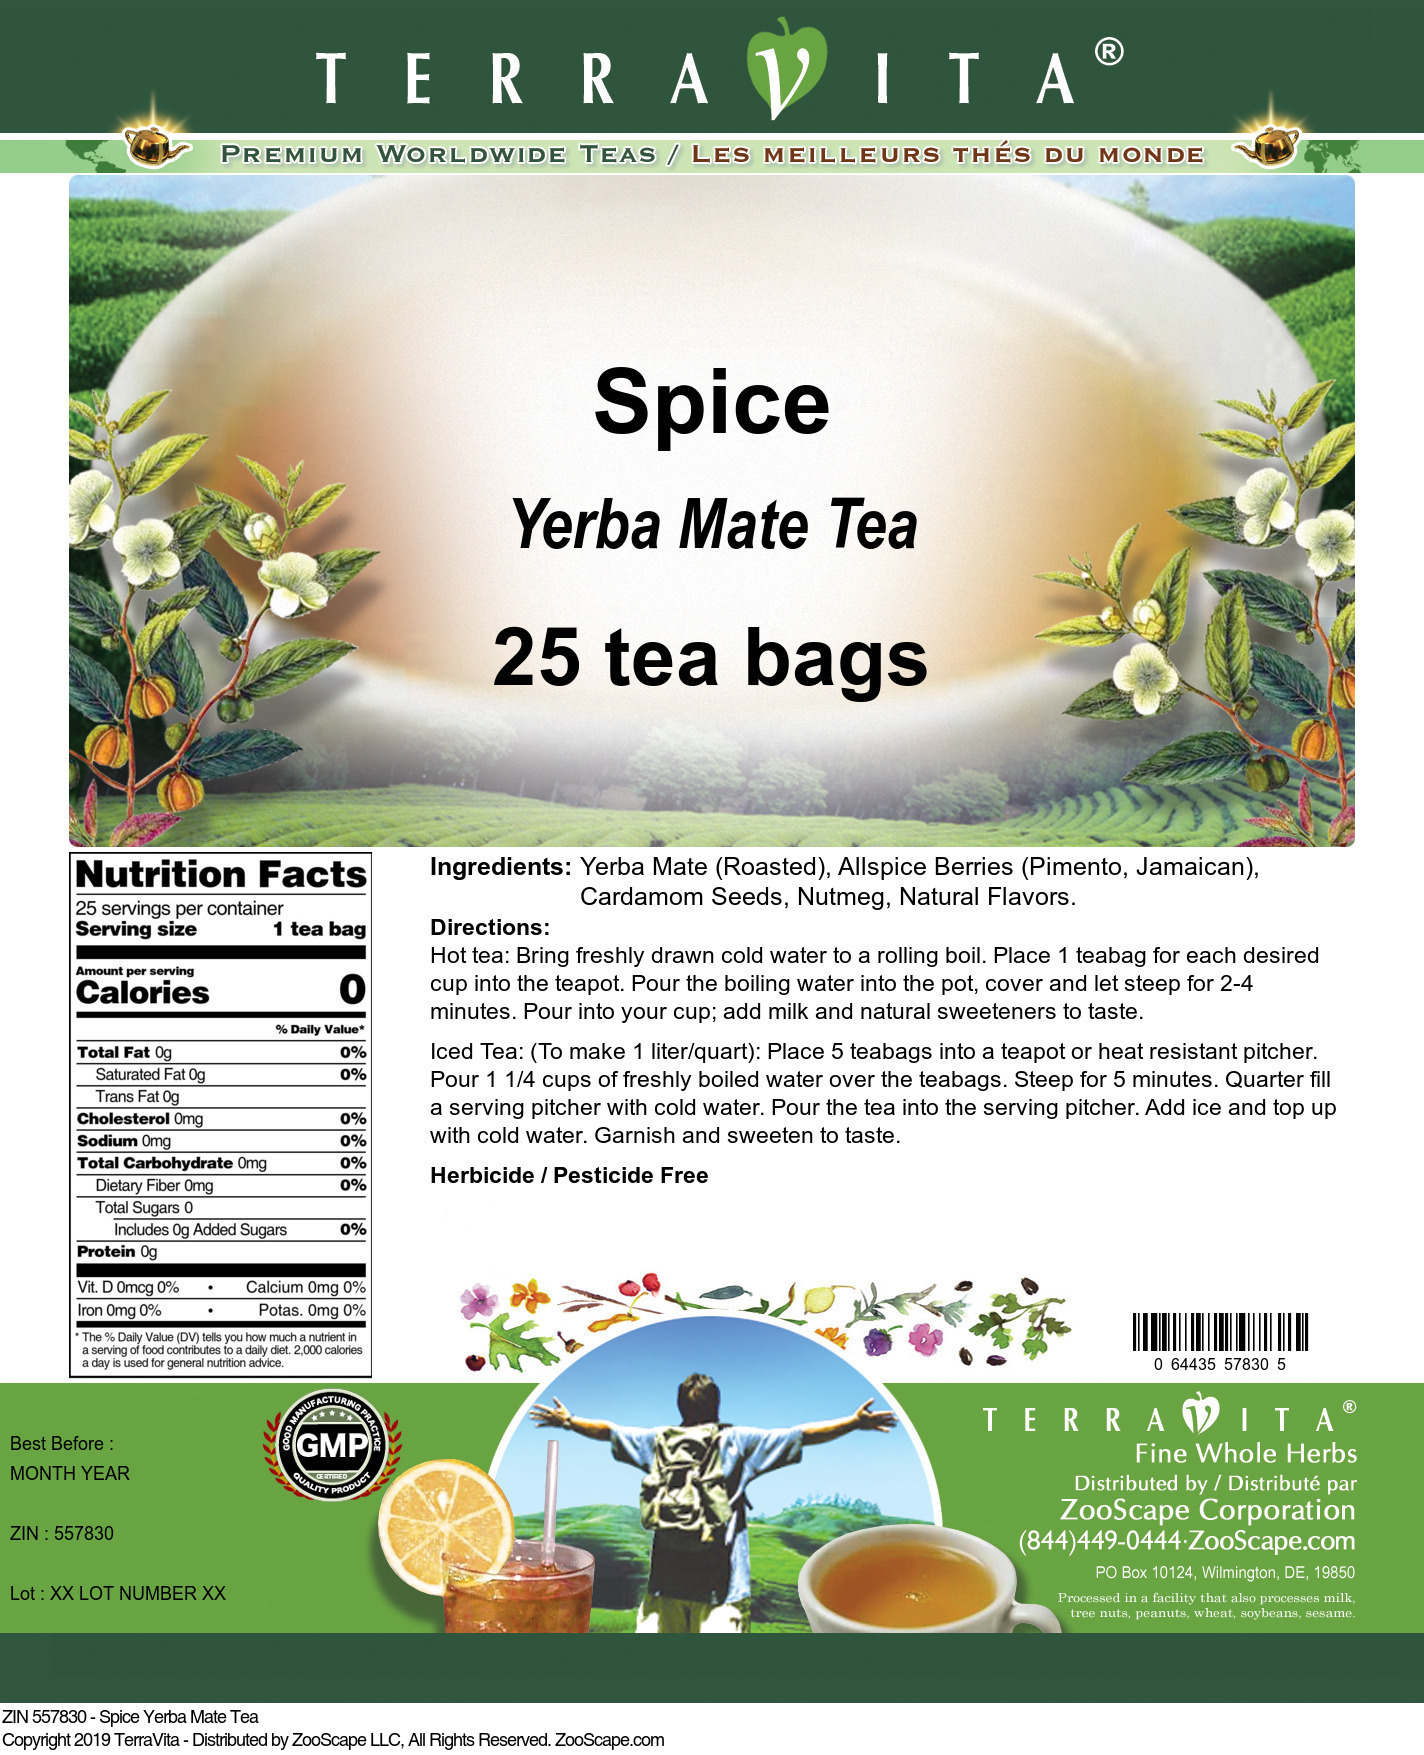 Spice Yerba Mate Tea